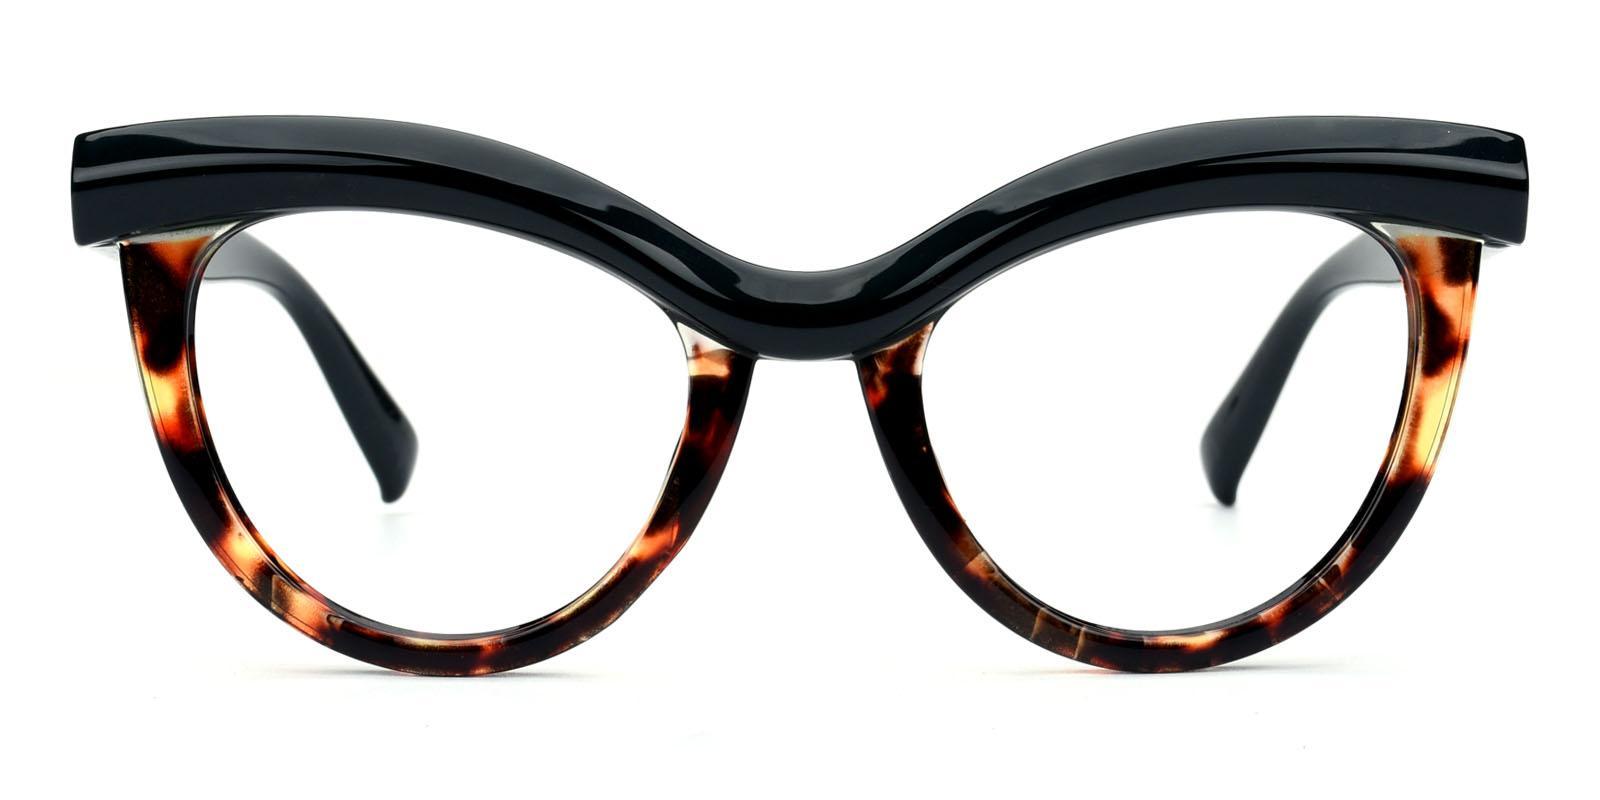 Traci-Green-Cat-Plastic-Eyeglasses-additional2